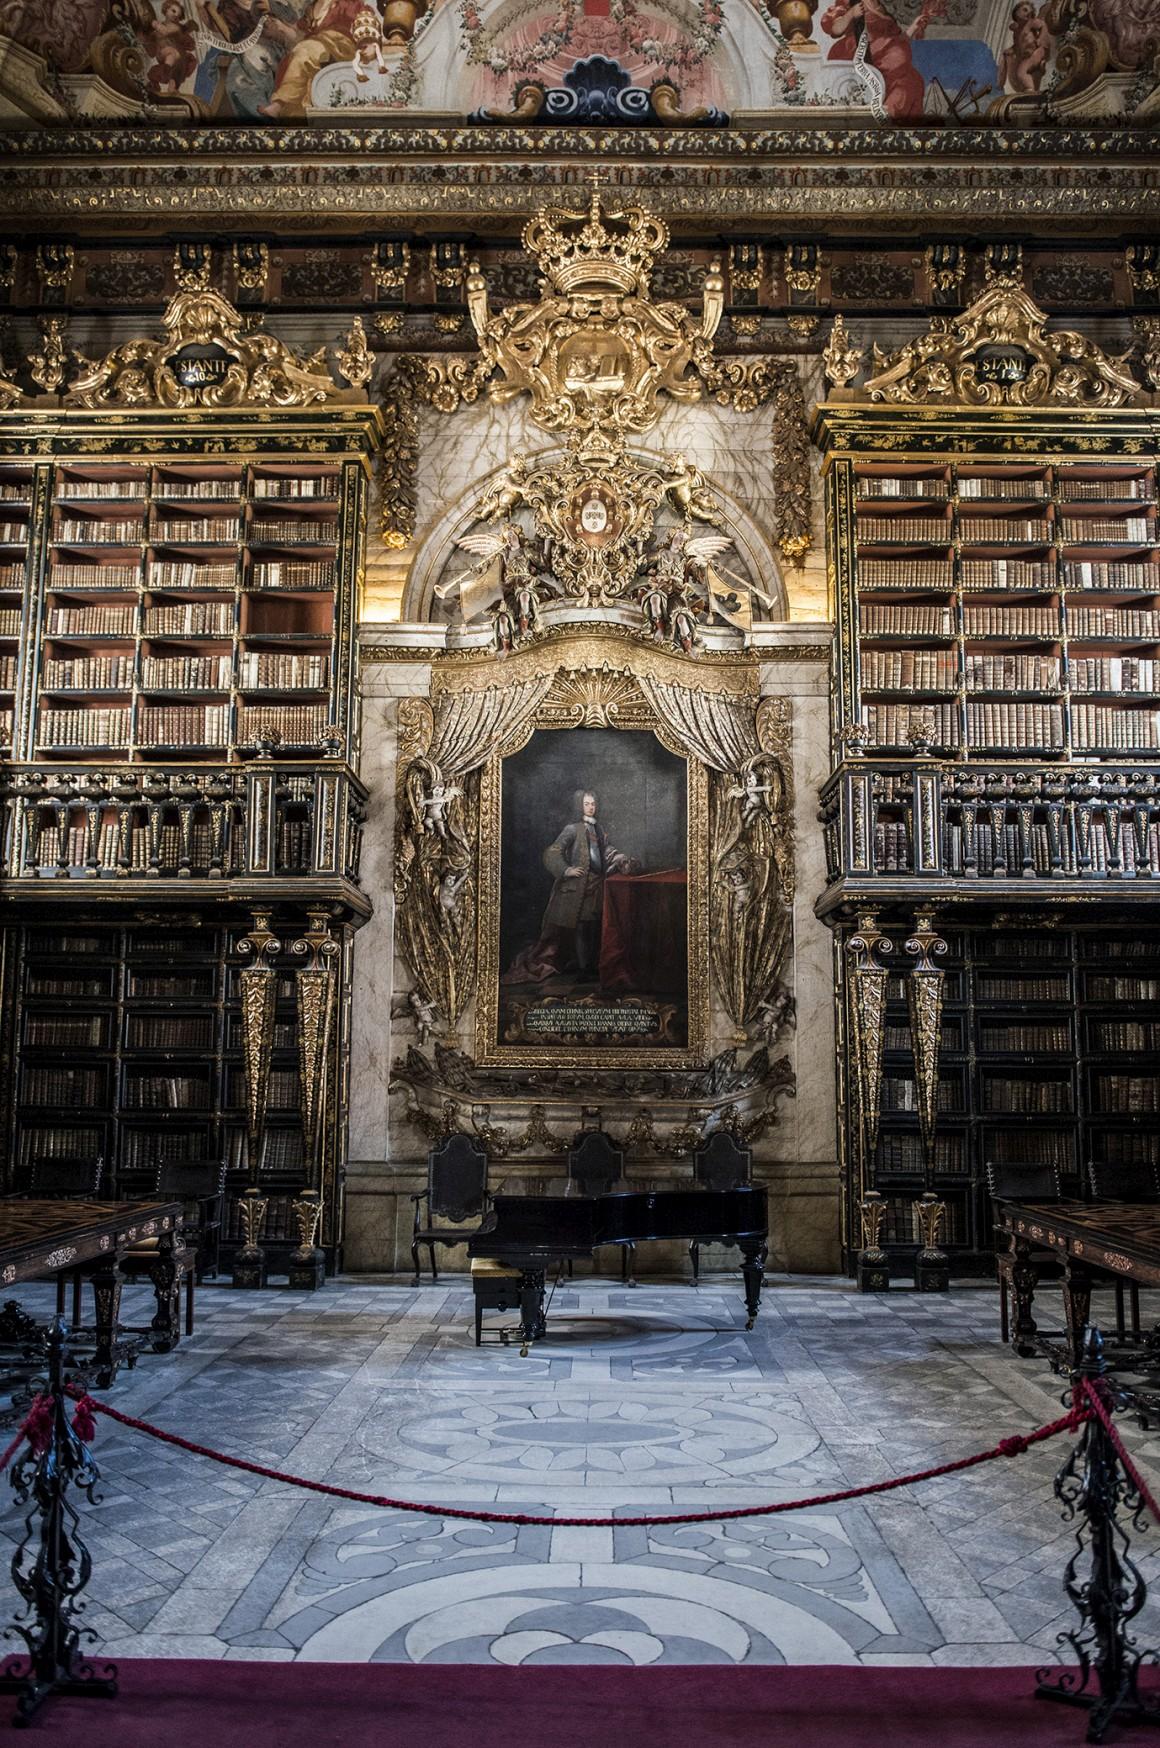 11h, visita à Universidade de Coimbra